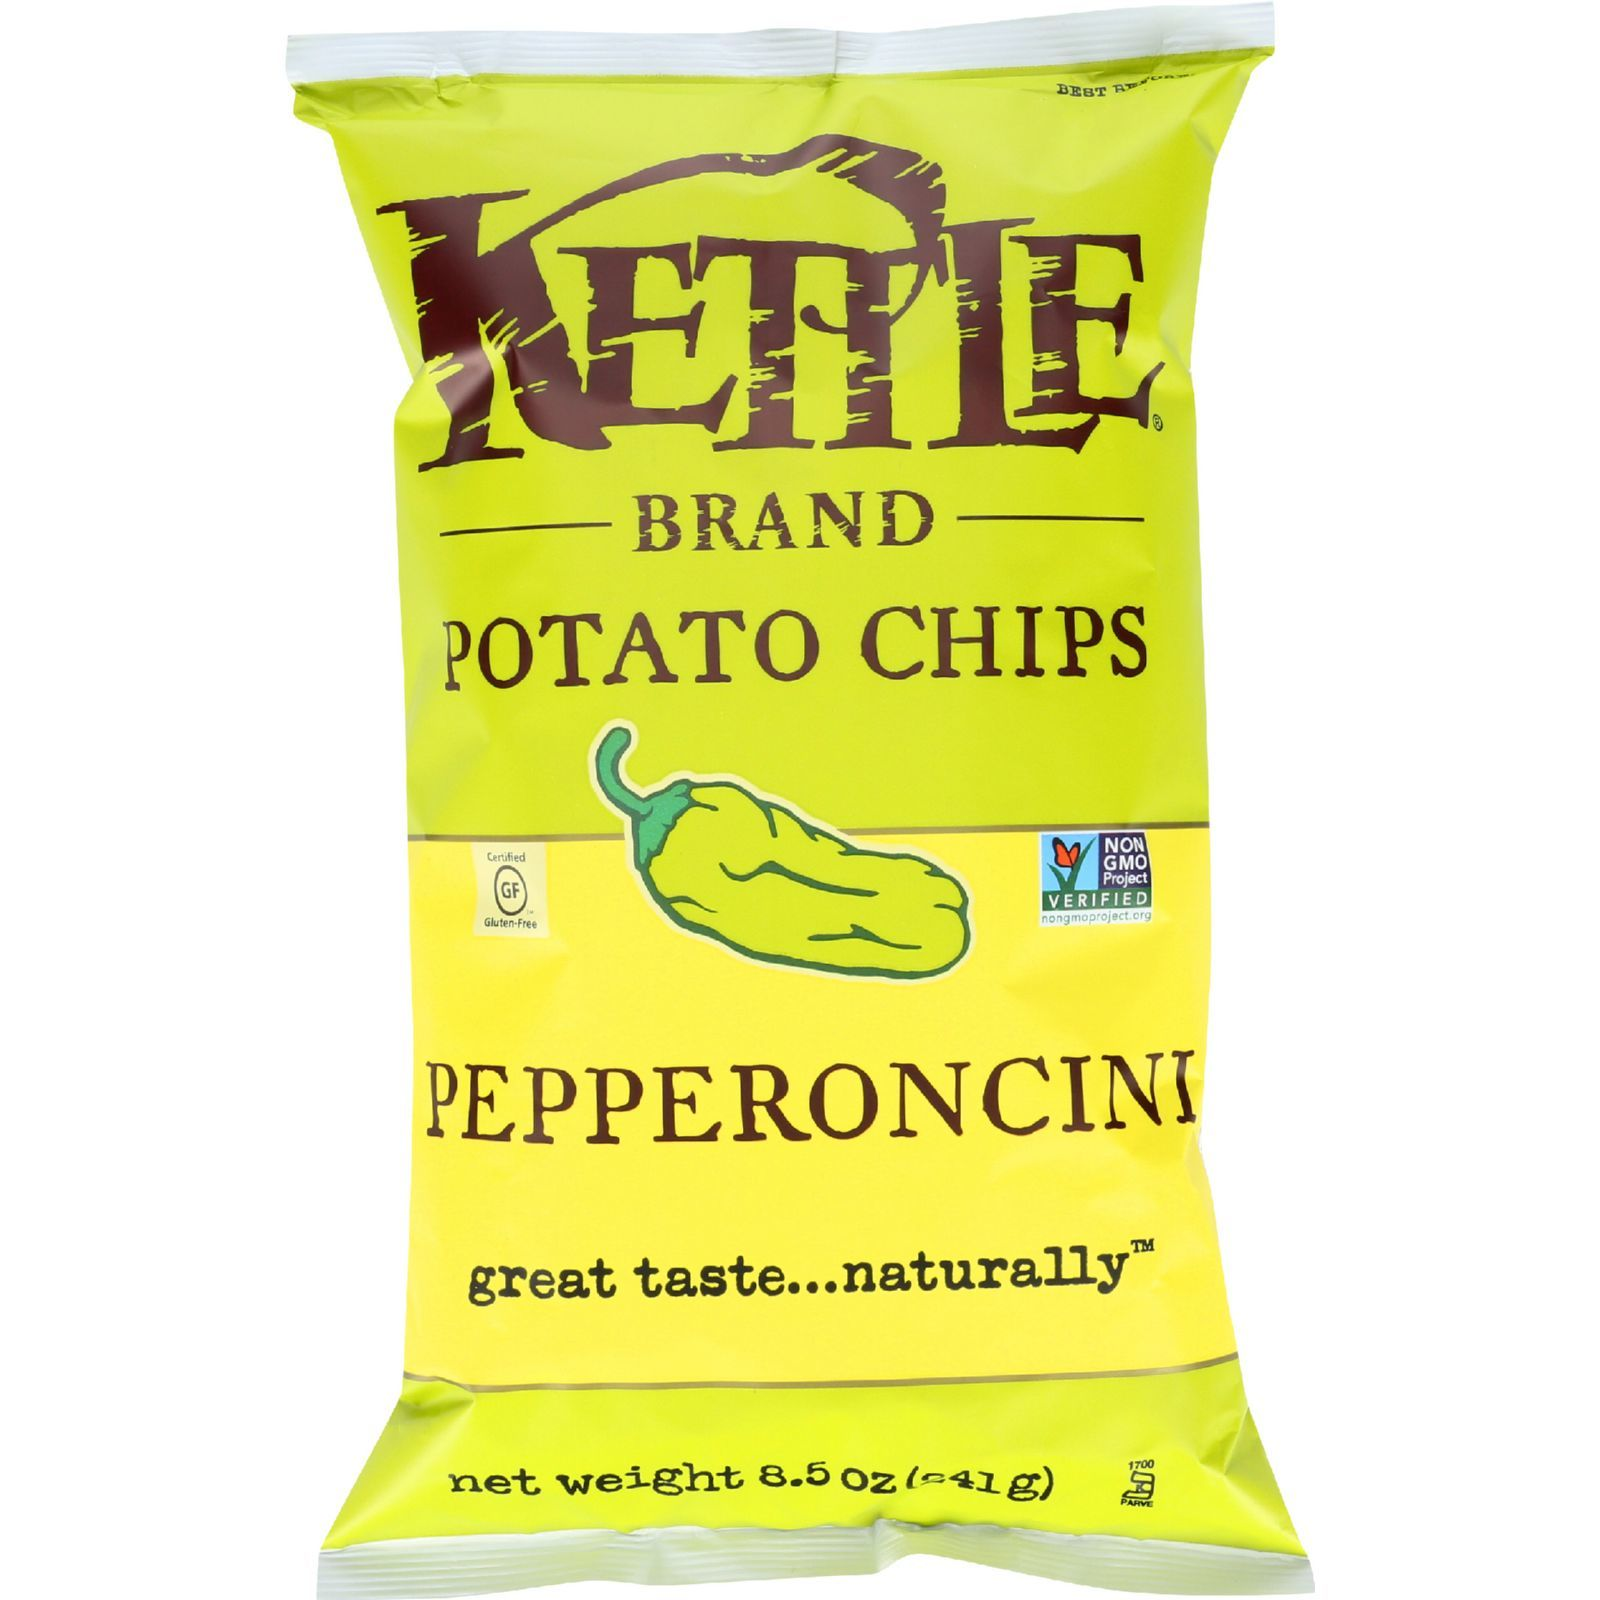 Kettle Brand Potato Chips - Pepperoncini - 8.5 oz - case of 12